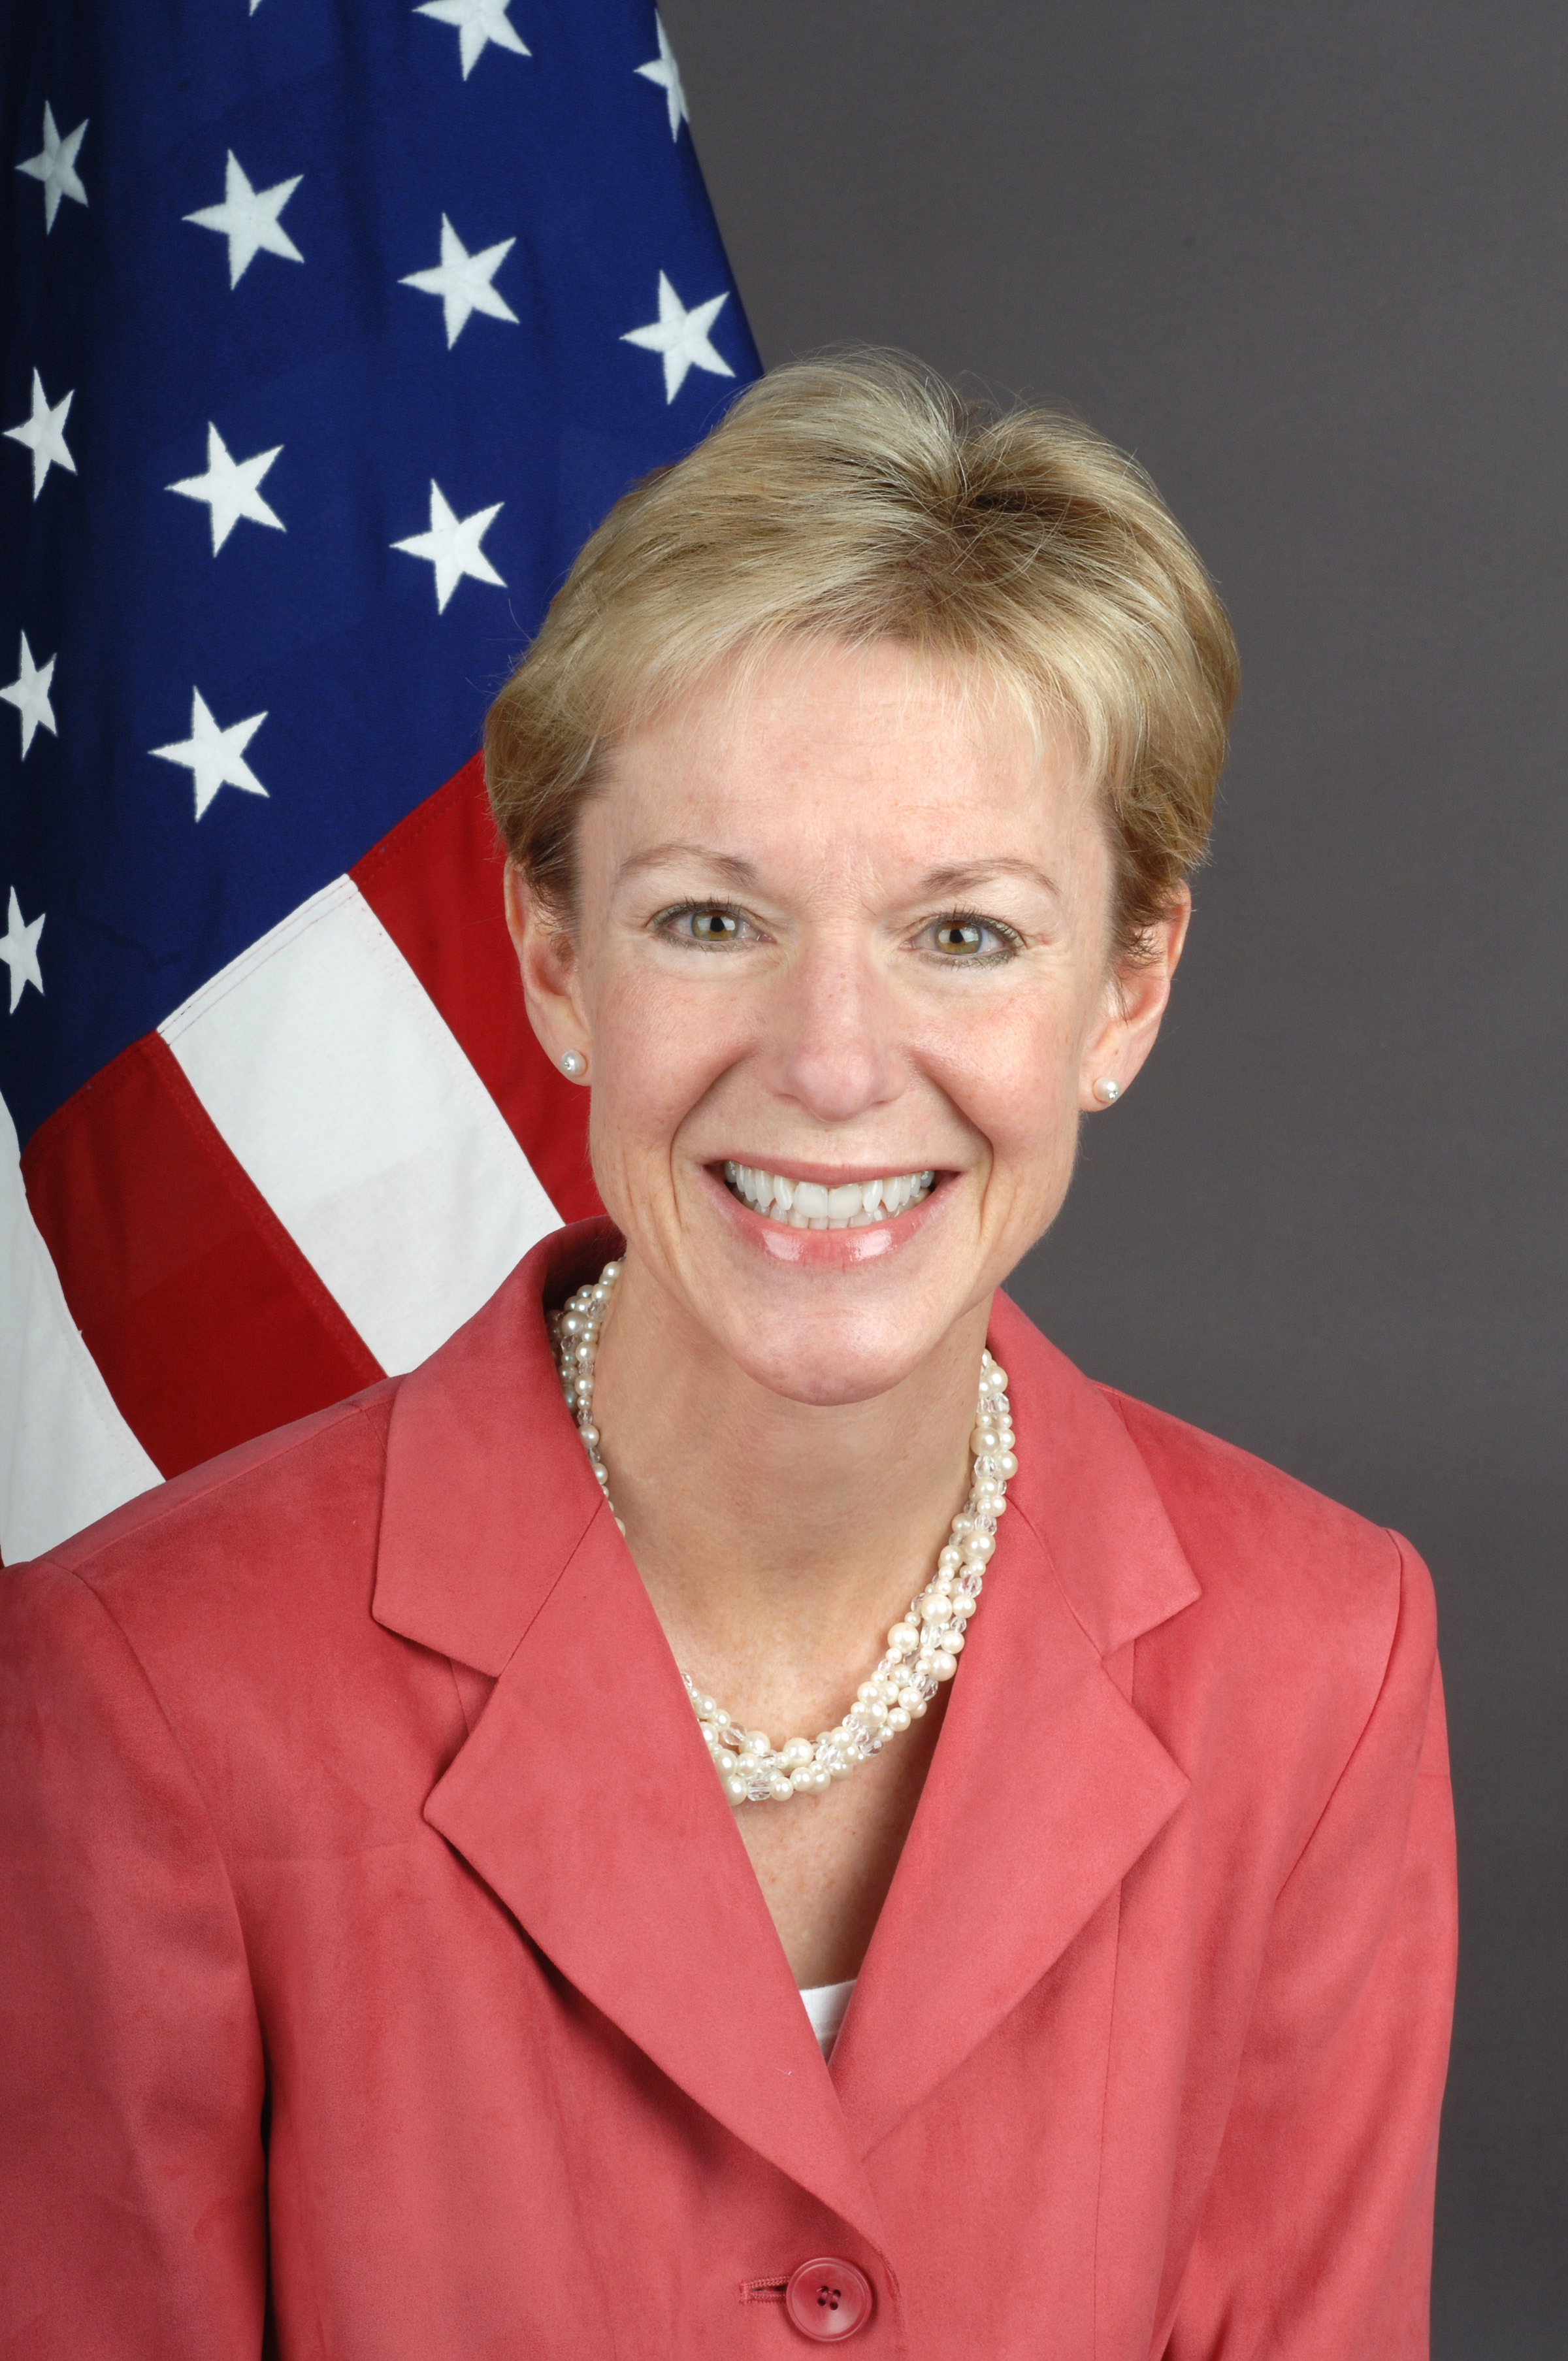 English: Kristie A. Kenney, U.S. Ambassador to...